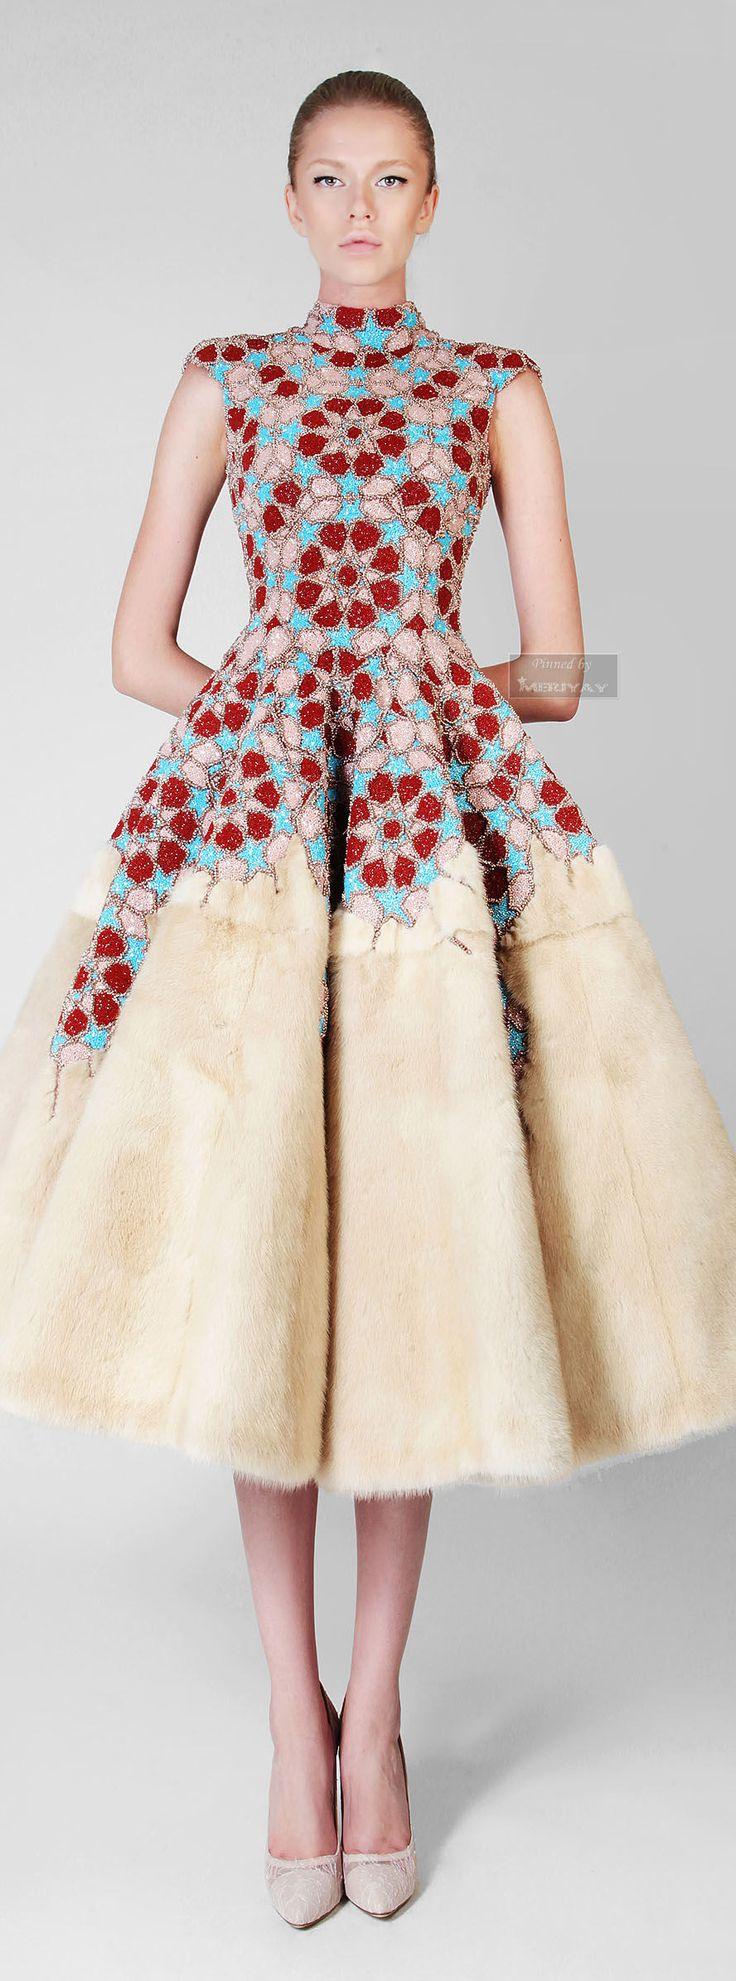 african style dresses rami kadi jaglady. african dressafrican ... QIUORGJ